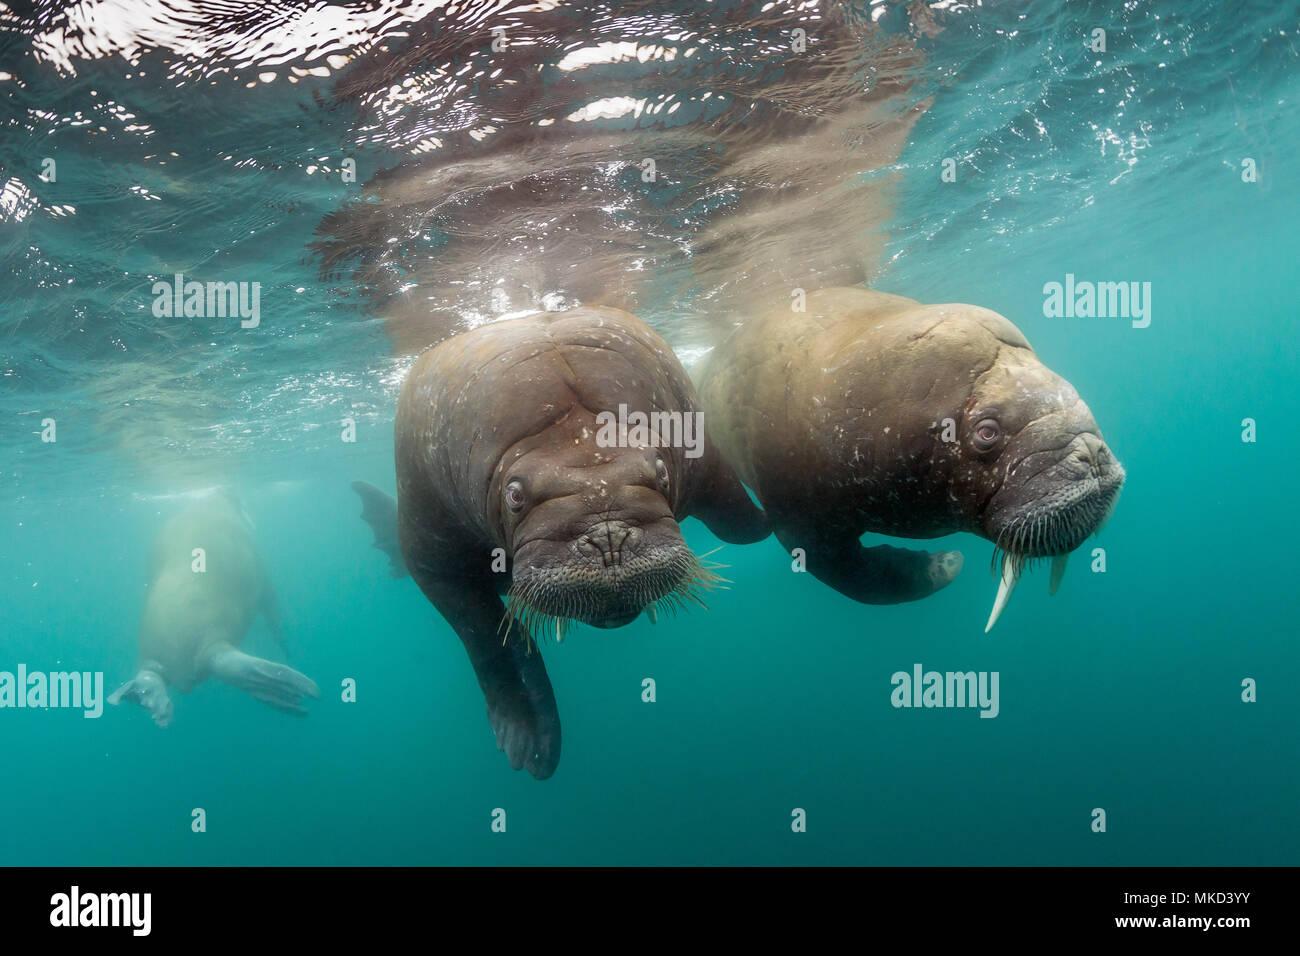 Pair of Atlantic walrus (Odobenus rosmarus), Spitsbergen, Svalbard, Norwegian archipelago, Norway, Arctic Ocean - Stock Image